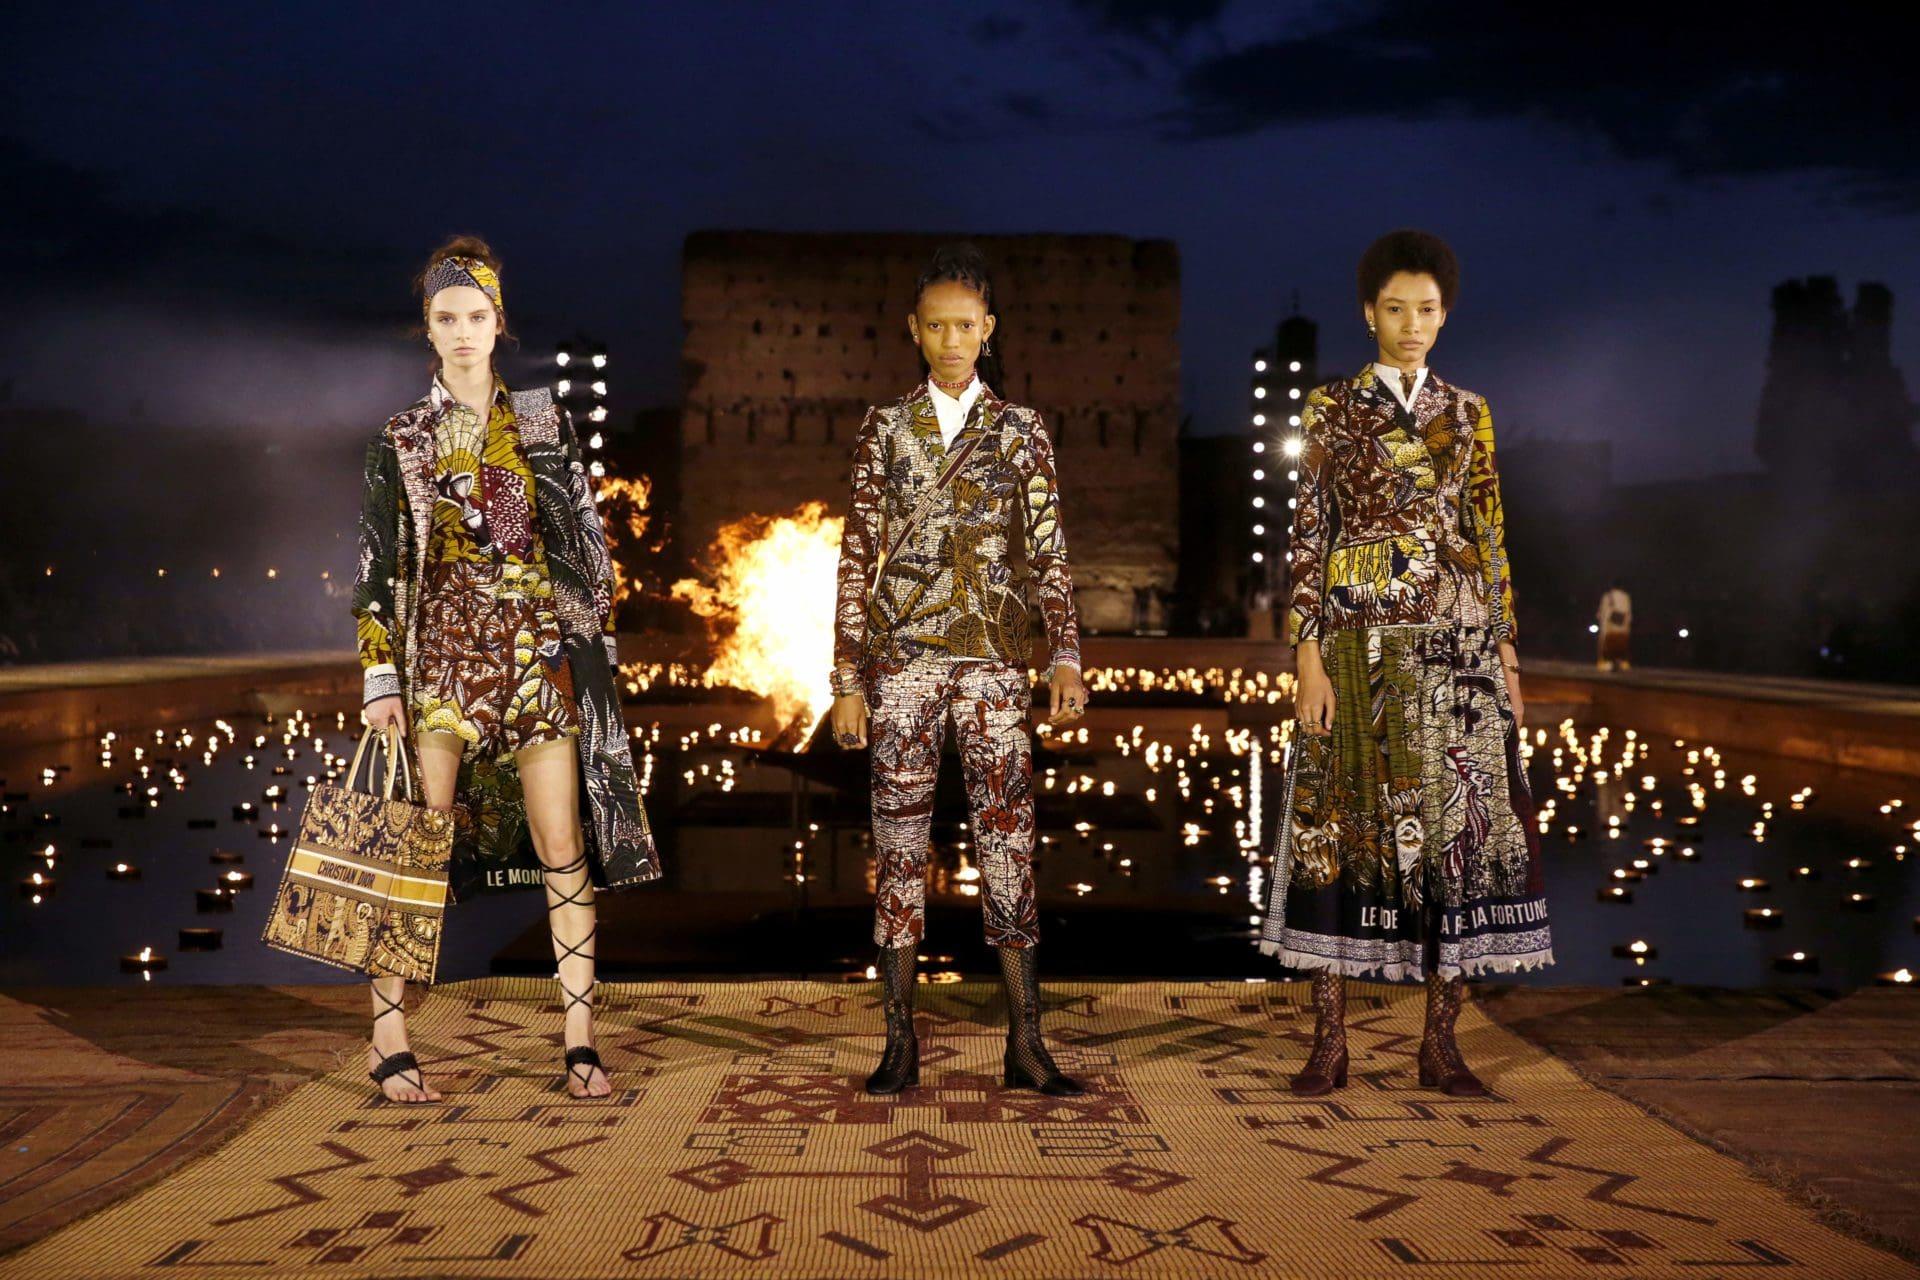 Image: Courtesy Dior